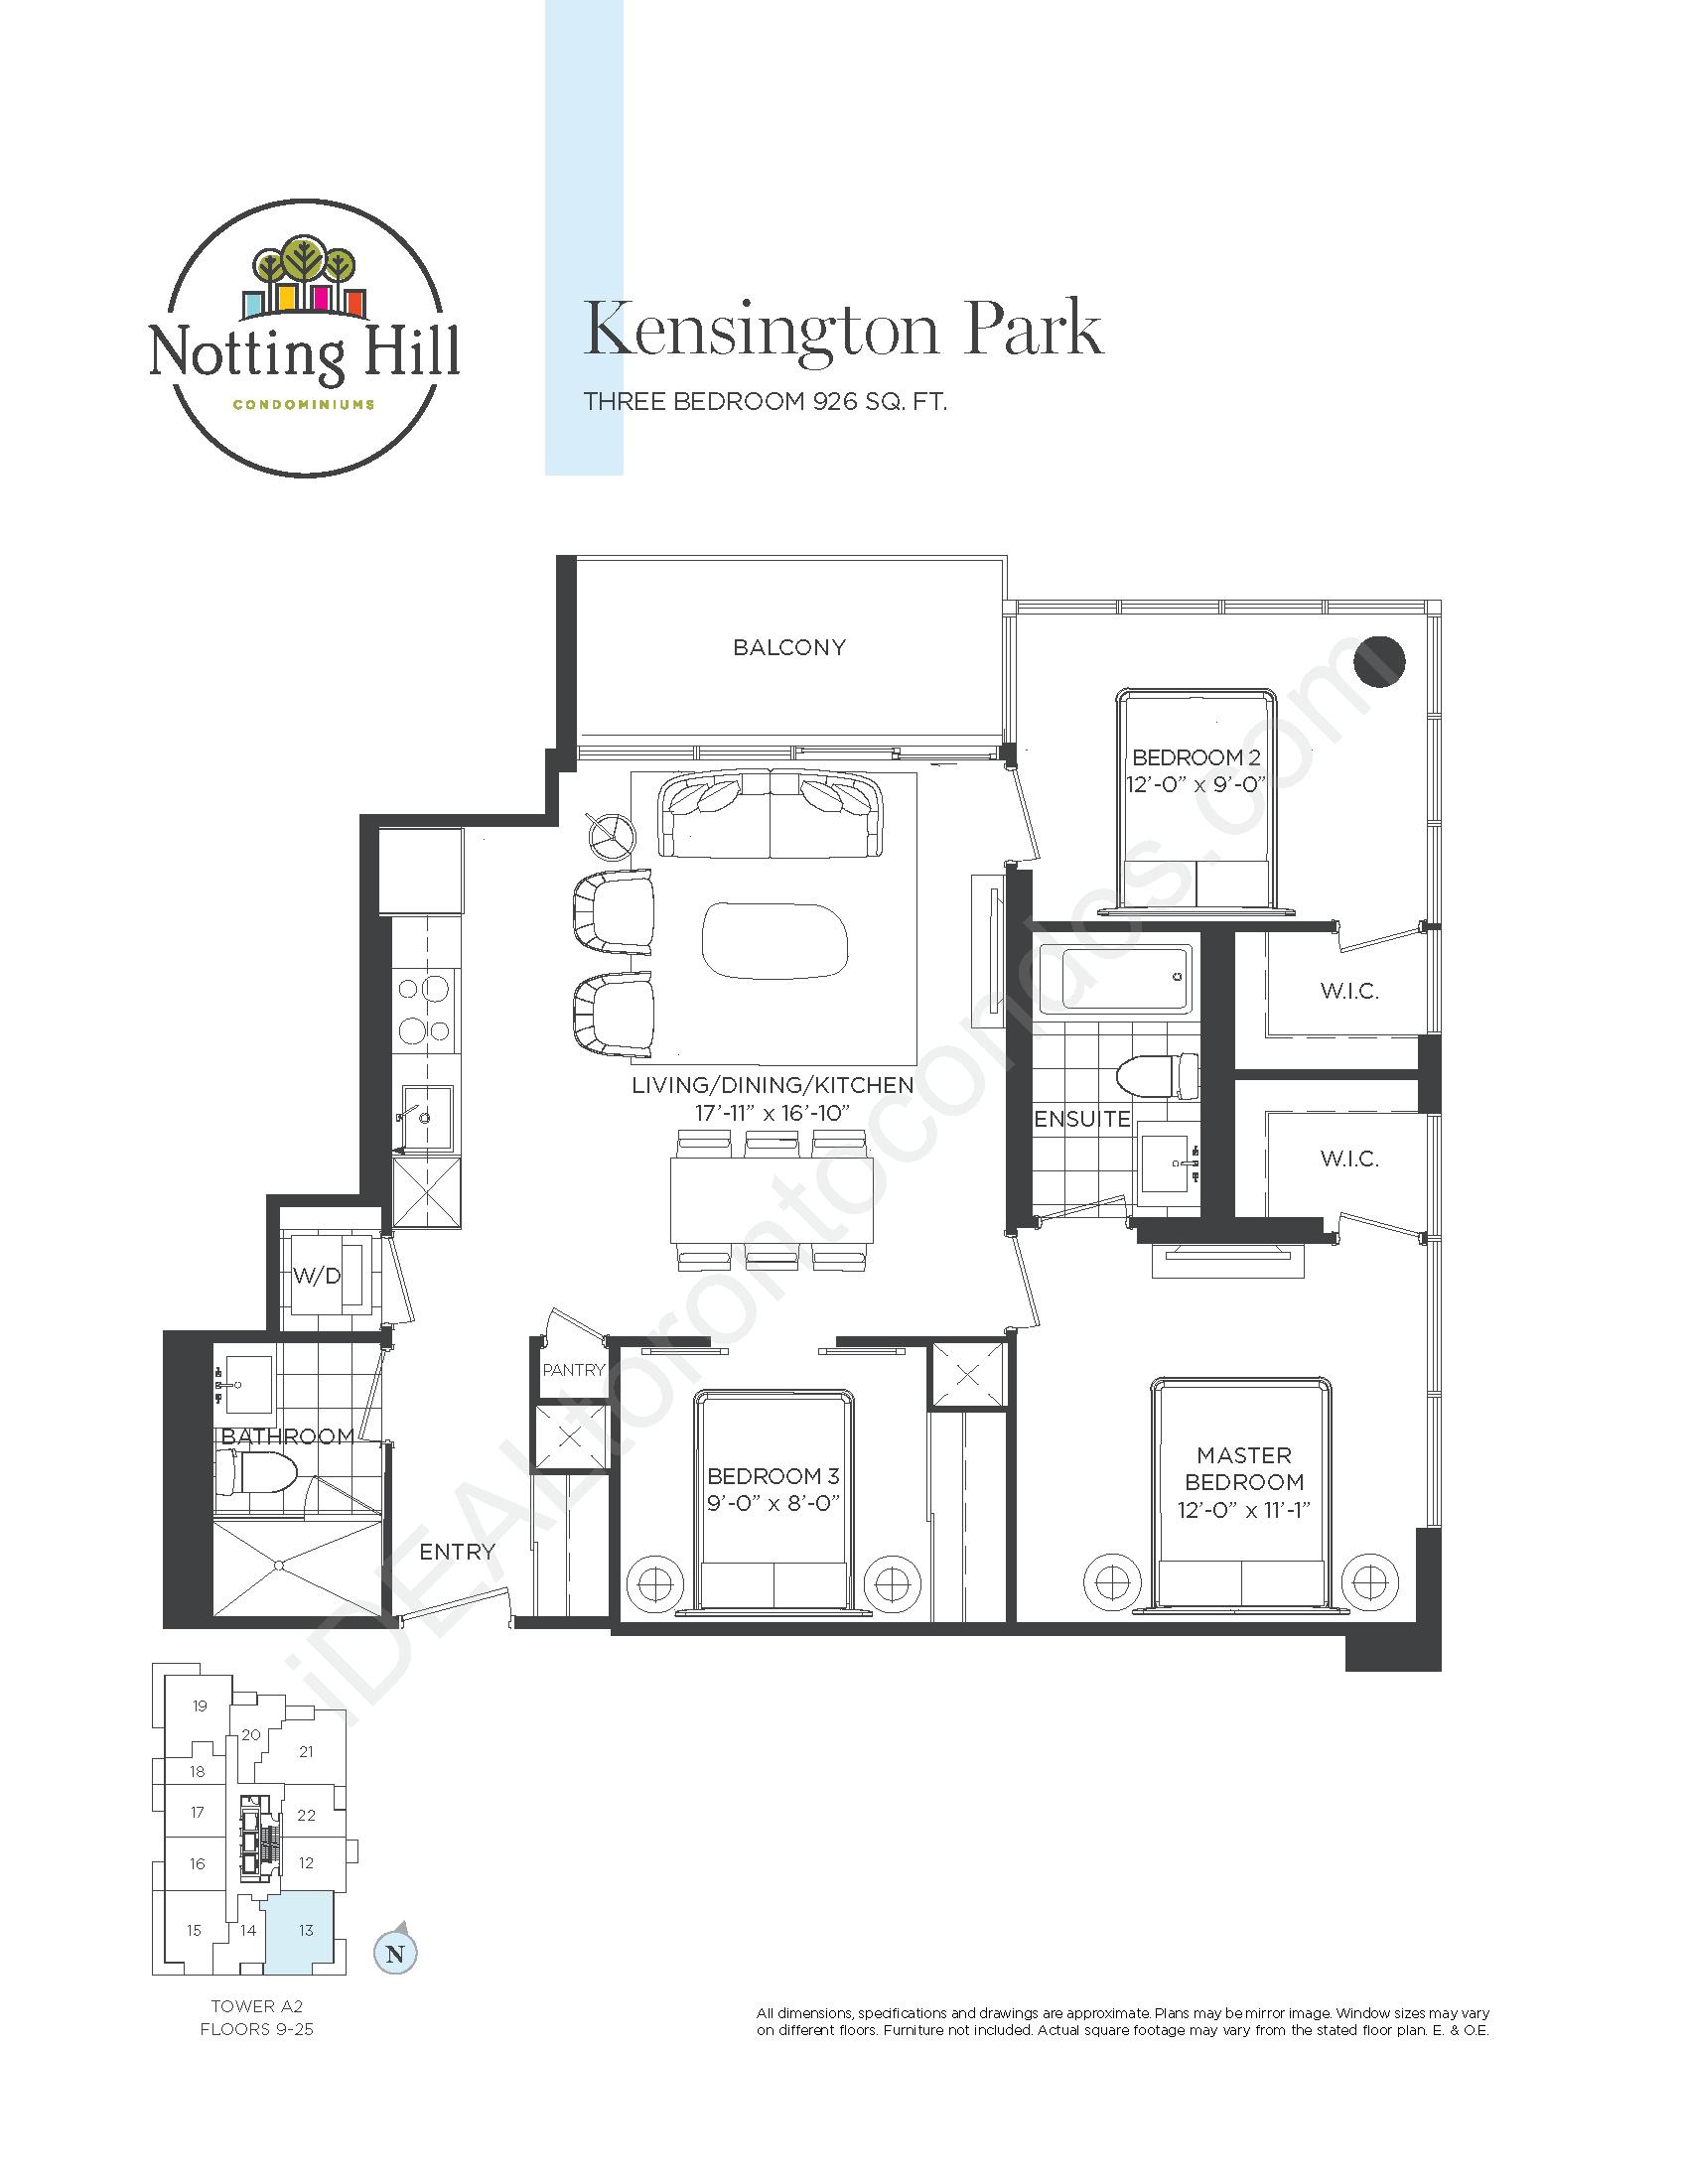 Kensington Park - Three bedroom